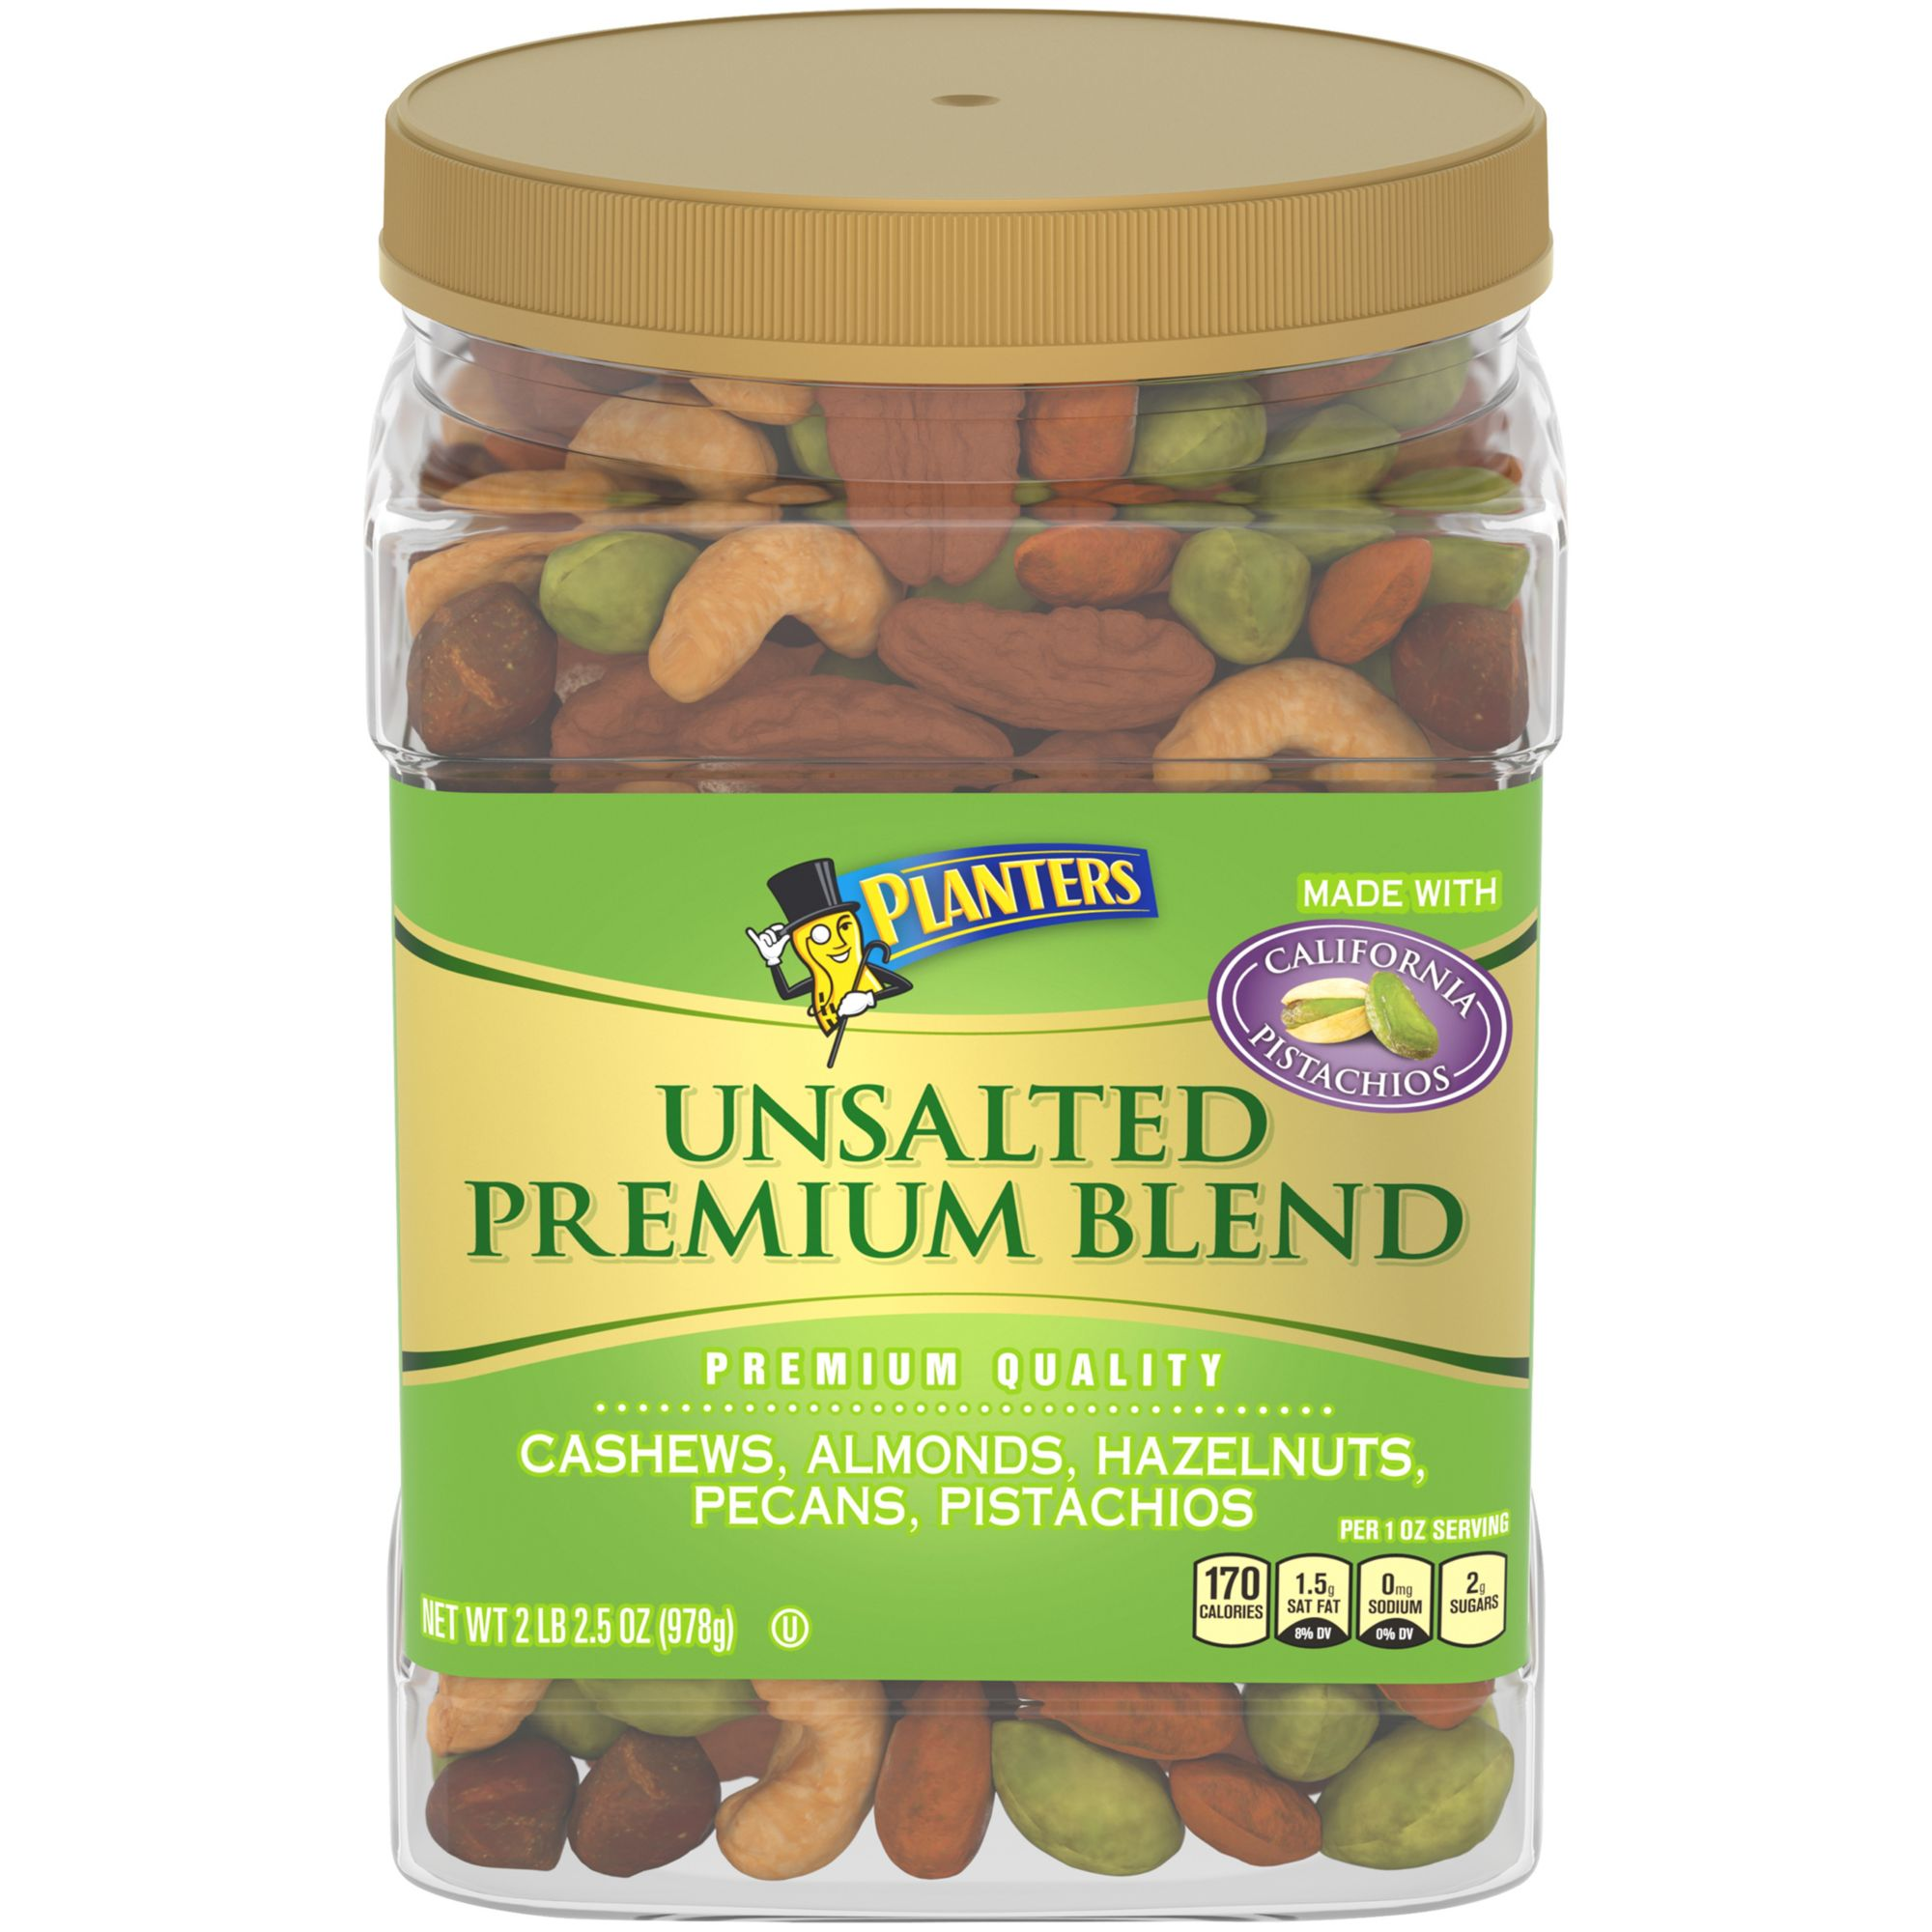 Planters Unsalted Premium Blend Mixed Nuts 345 oz BJs